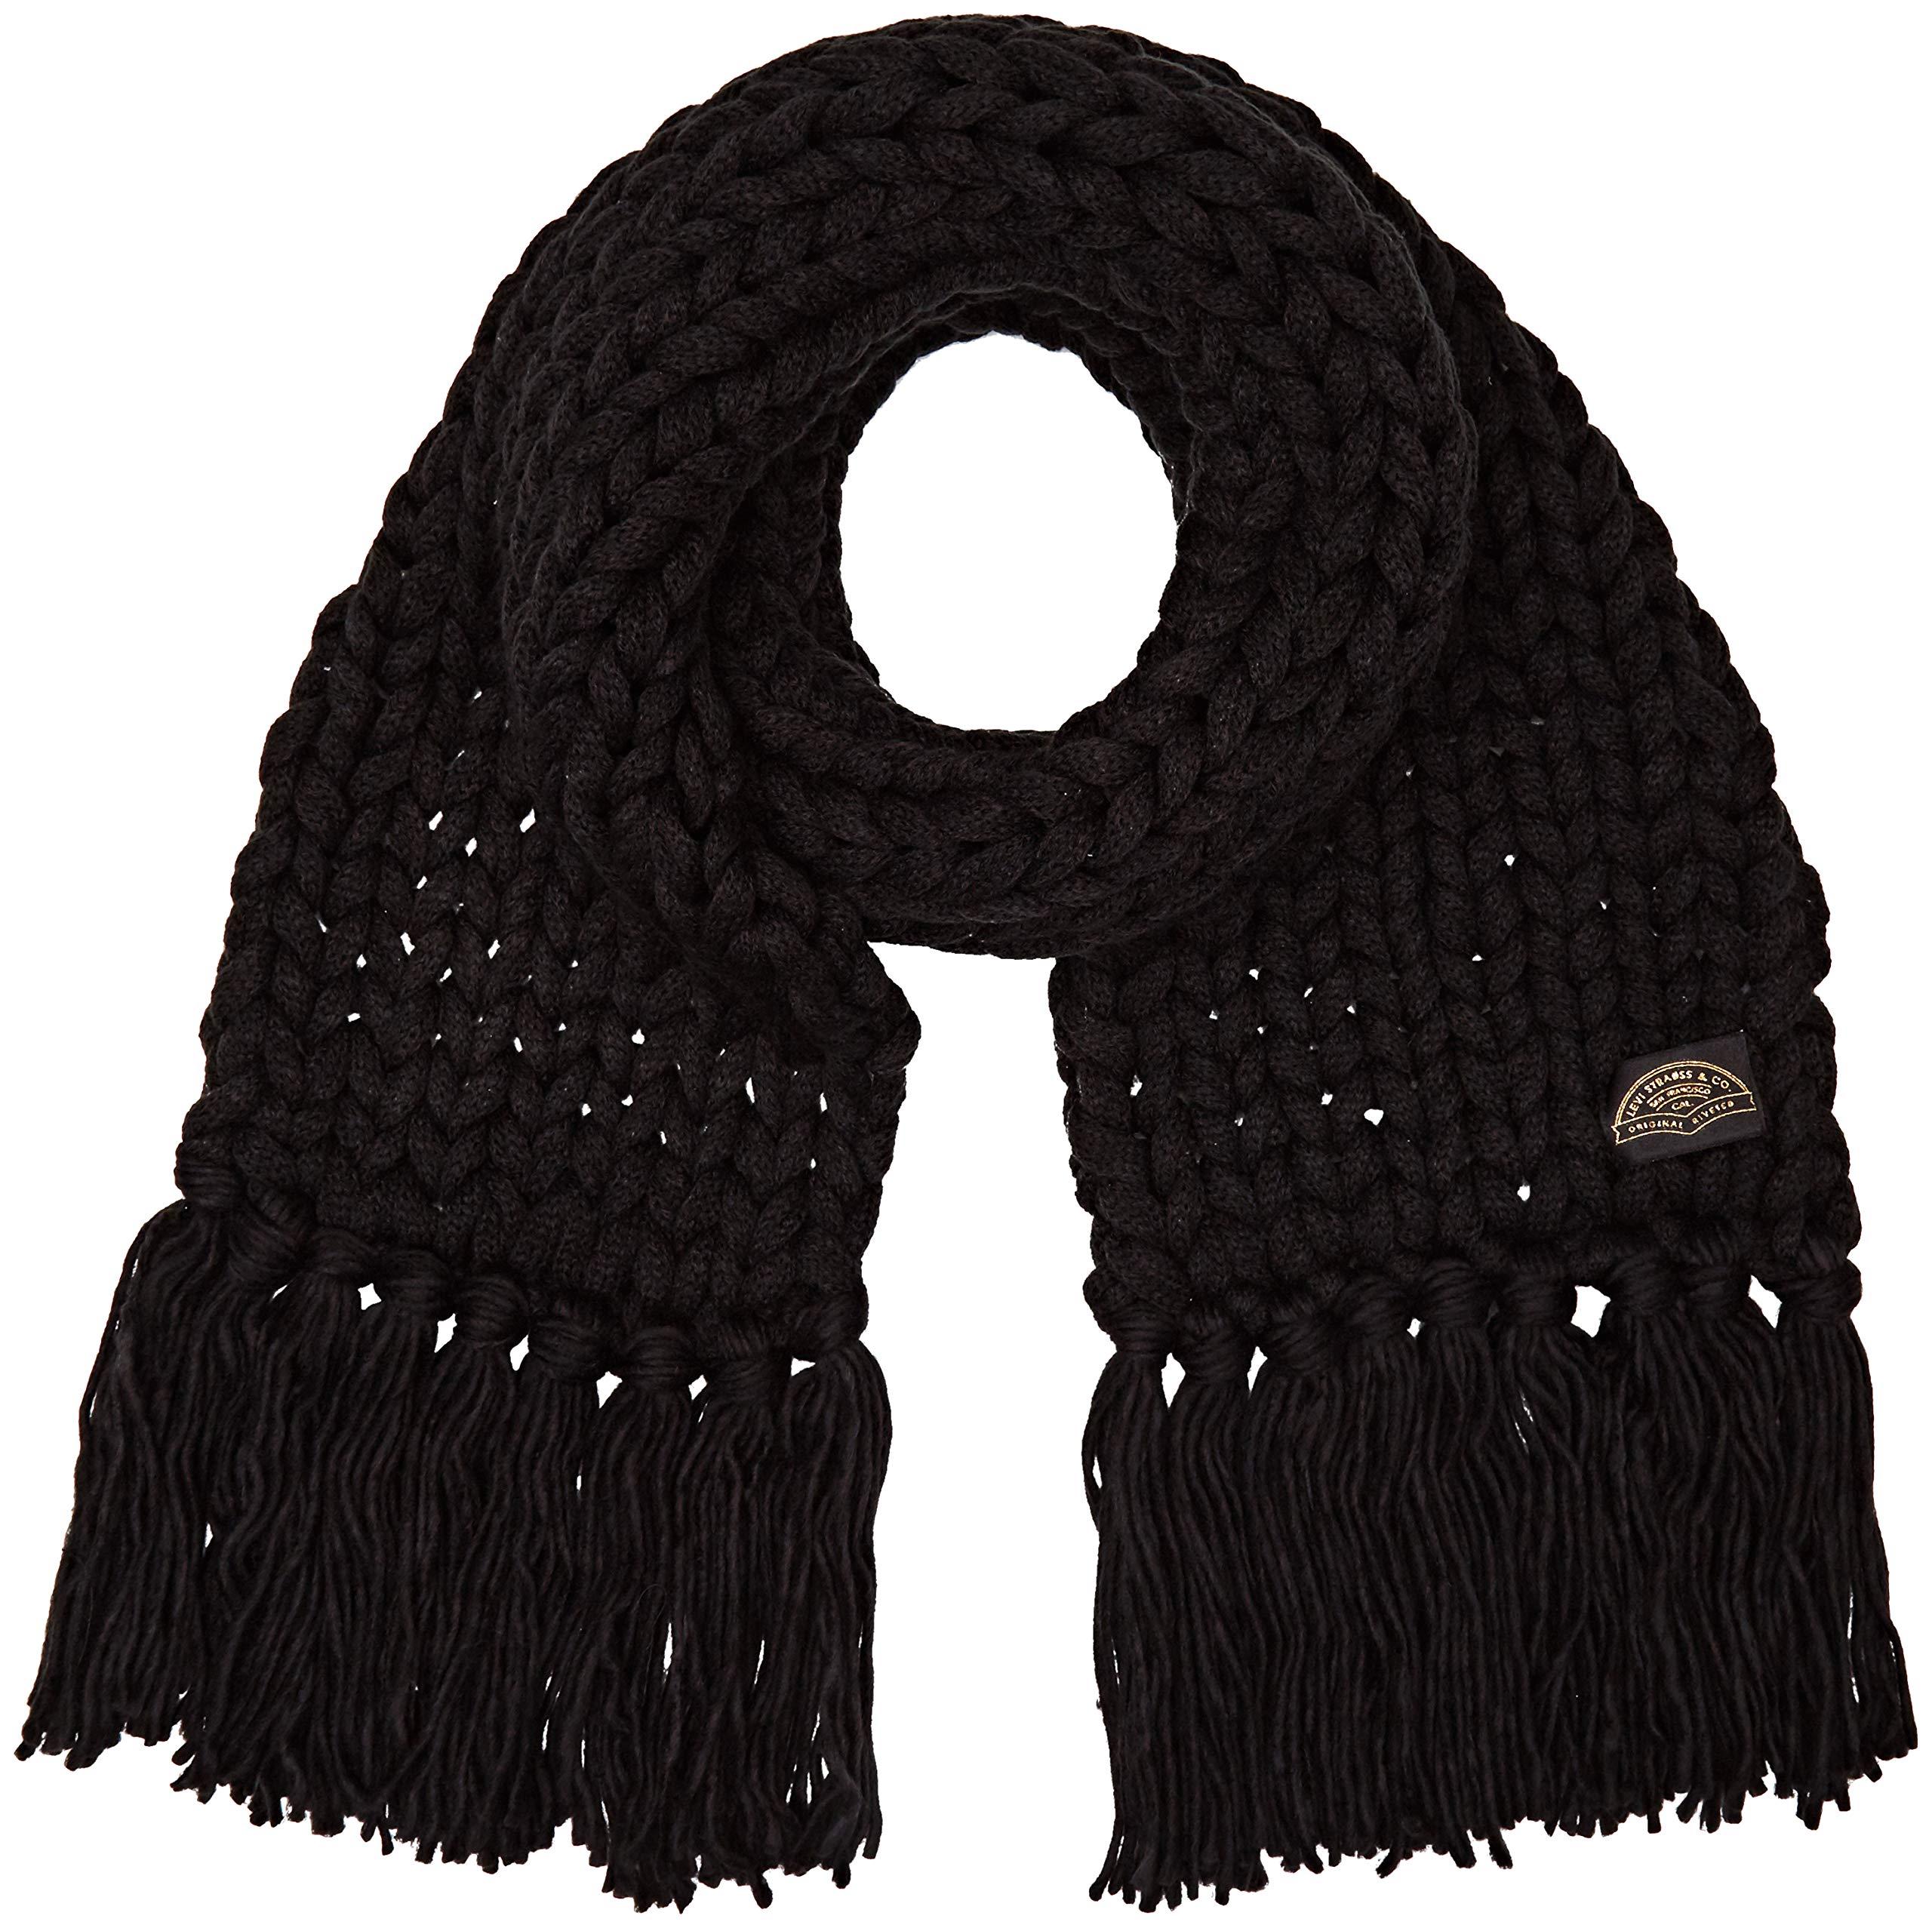 Knit Black Oversized Regular 59Uniquetaille Echarpenoir Chunky FabricantUnFemme Scarf Levi's MqzSUVGp